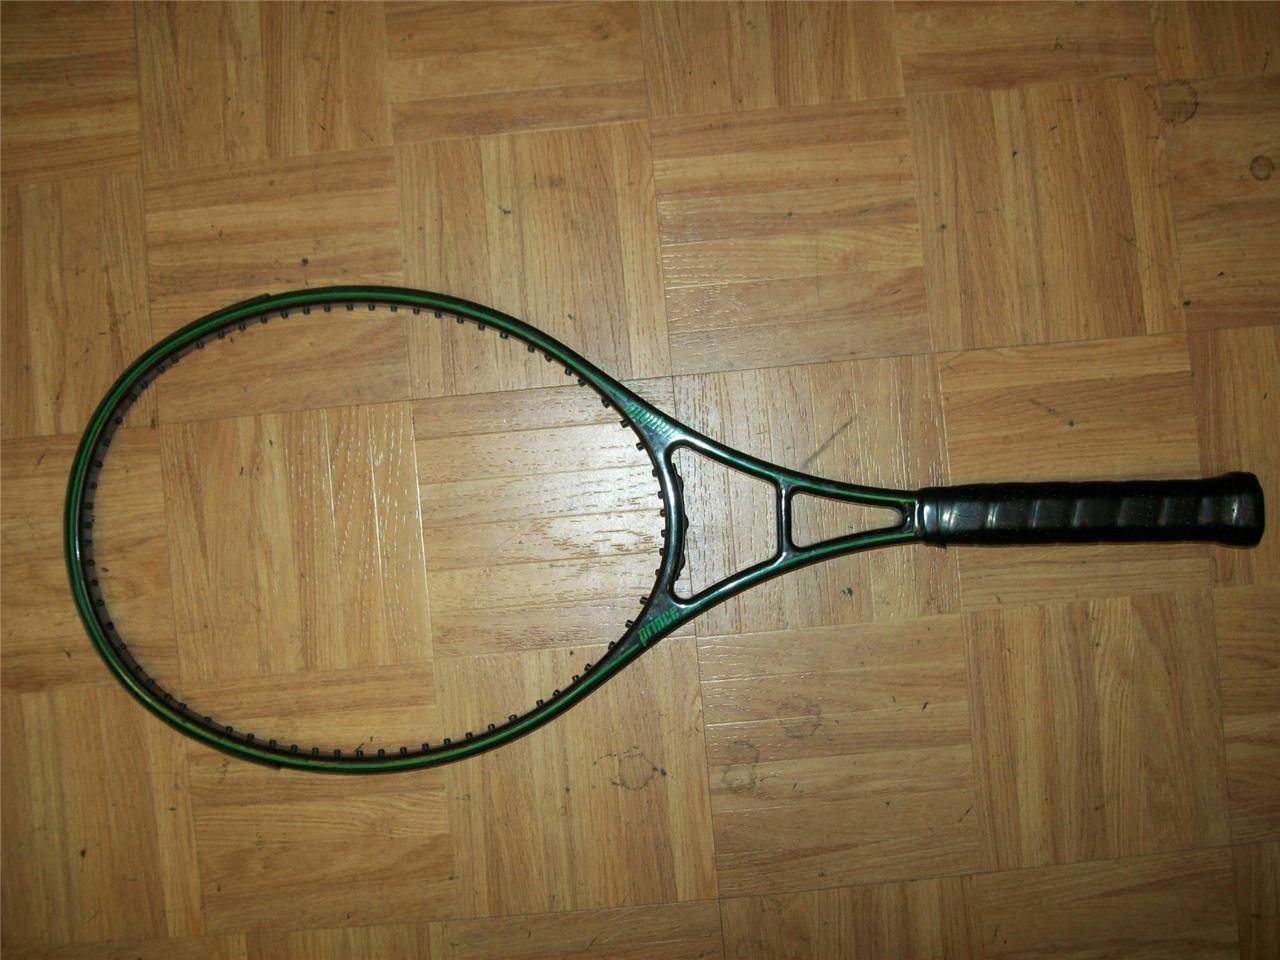 Prince Graphite Original OS Series 110 head 4 1 2 grip Tennis Racquet